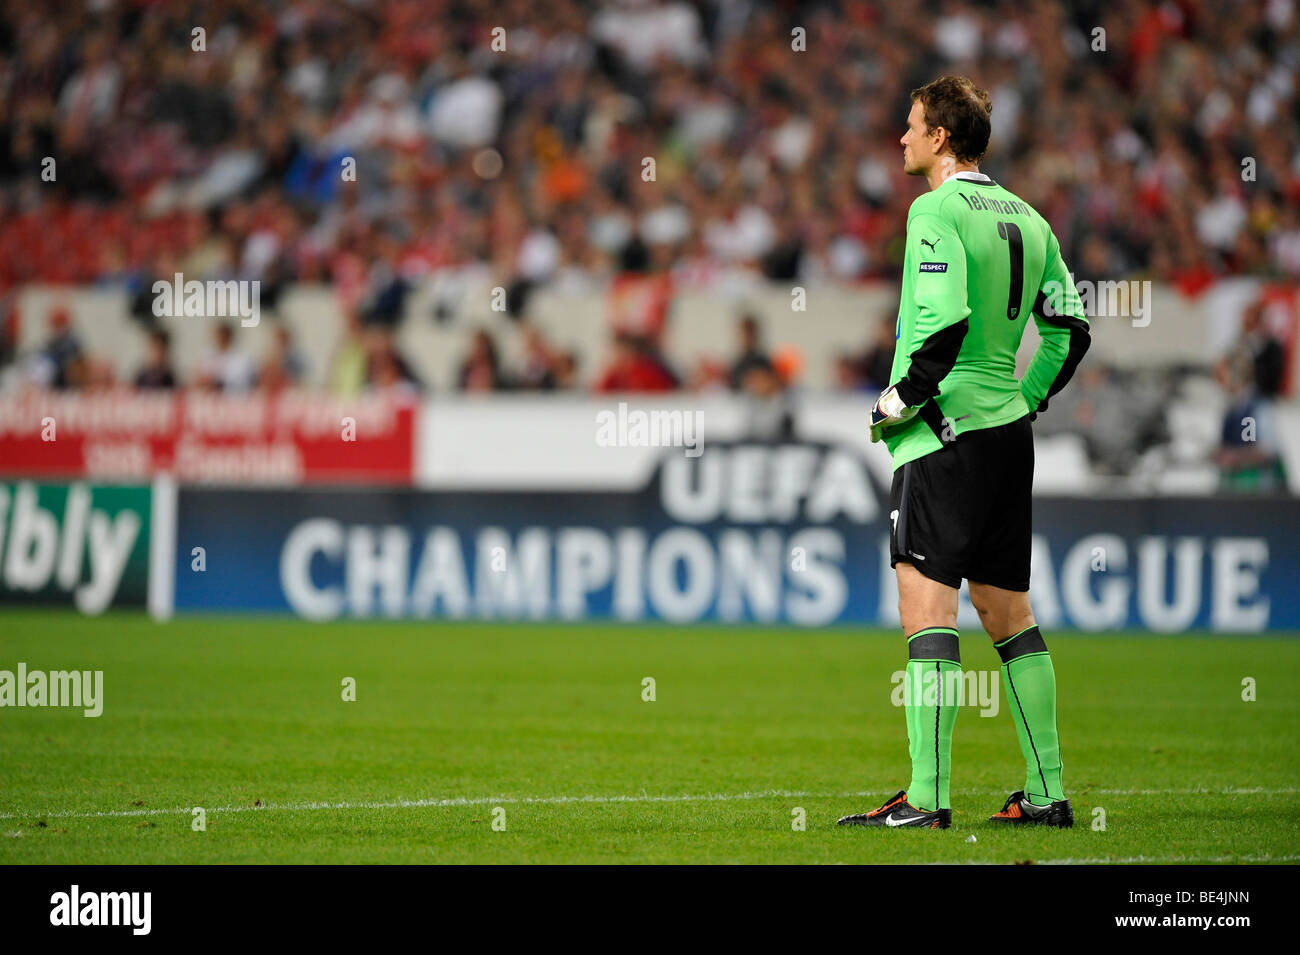 Goalkeeper Jens Lehmann, VfB Stuttgart, in front of advertising for the UEFA Champions League - Stock Image